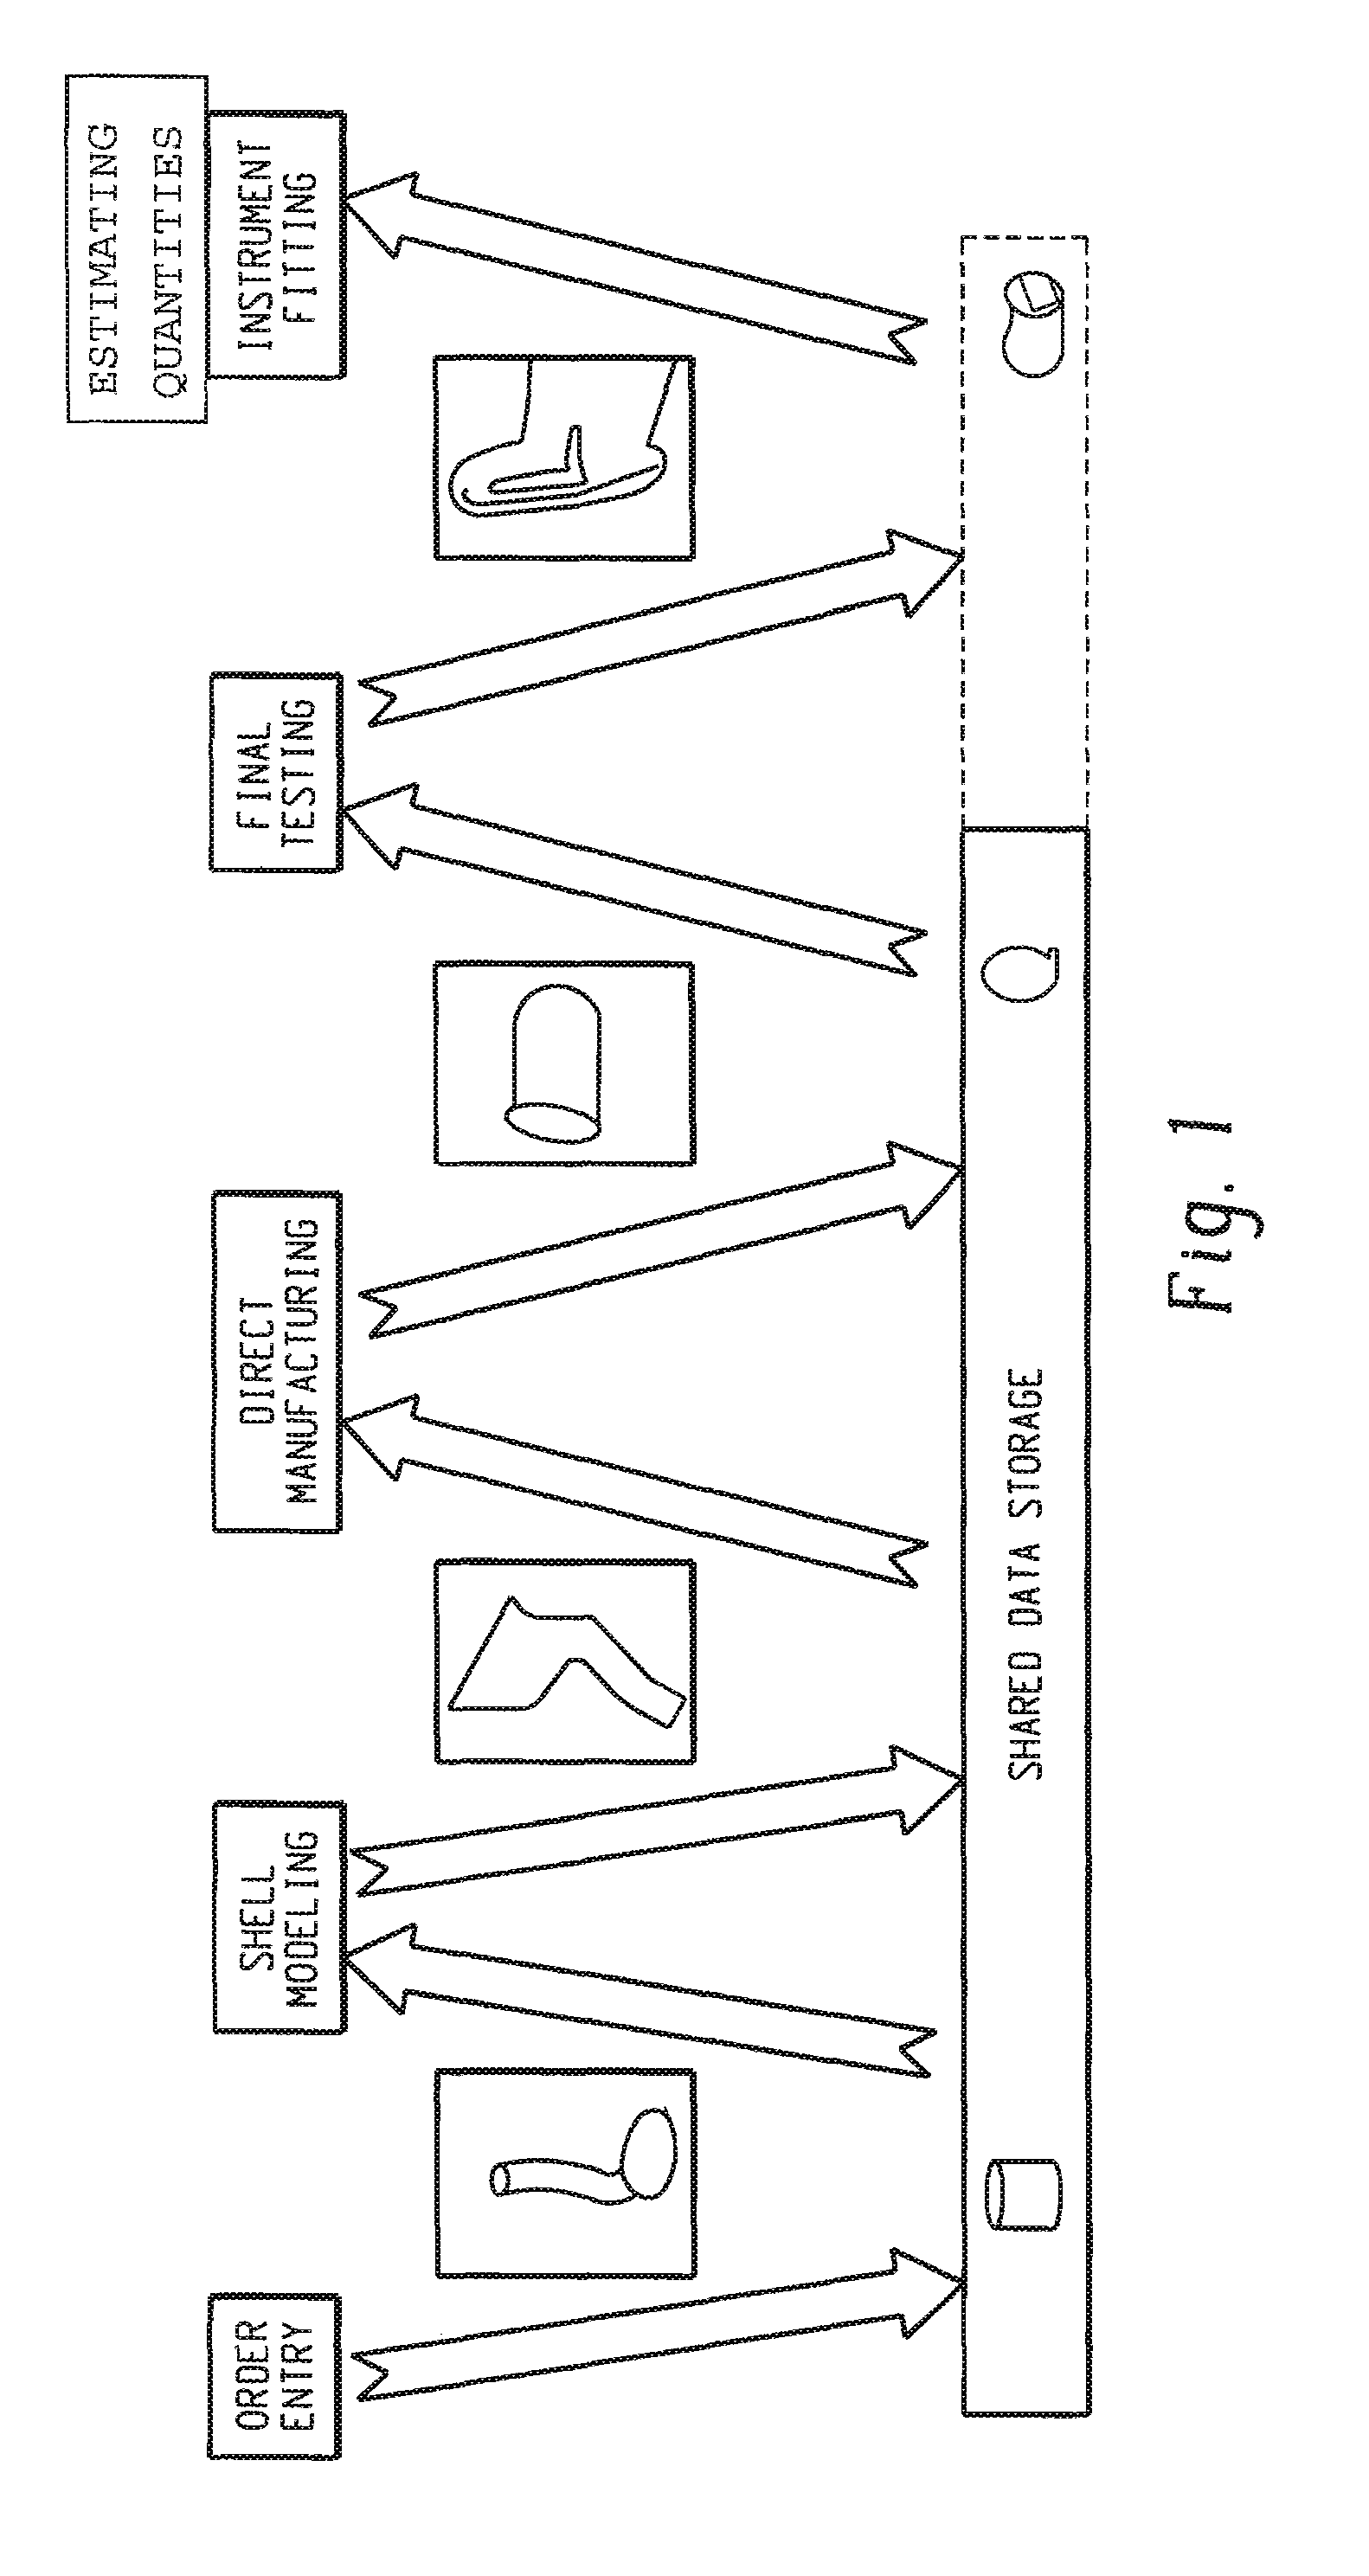 cox3211b电路图